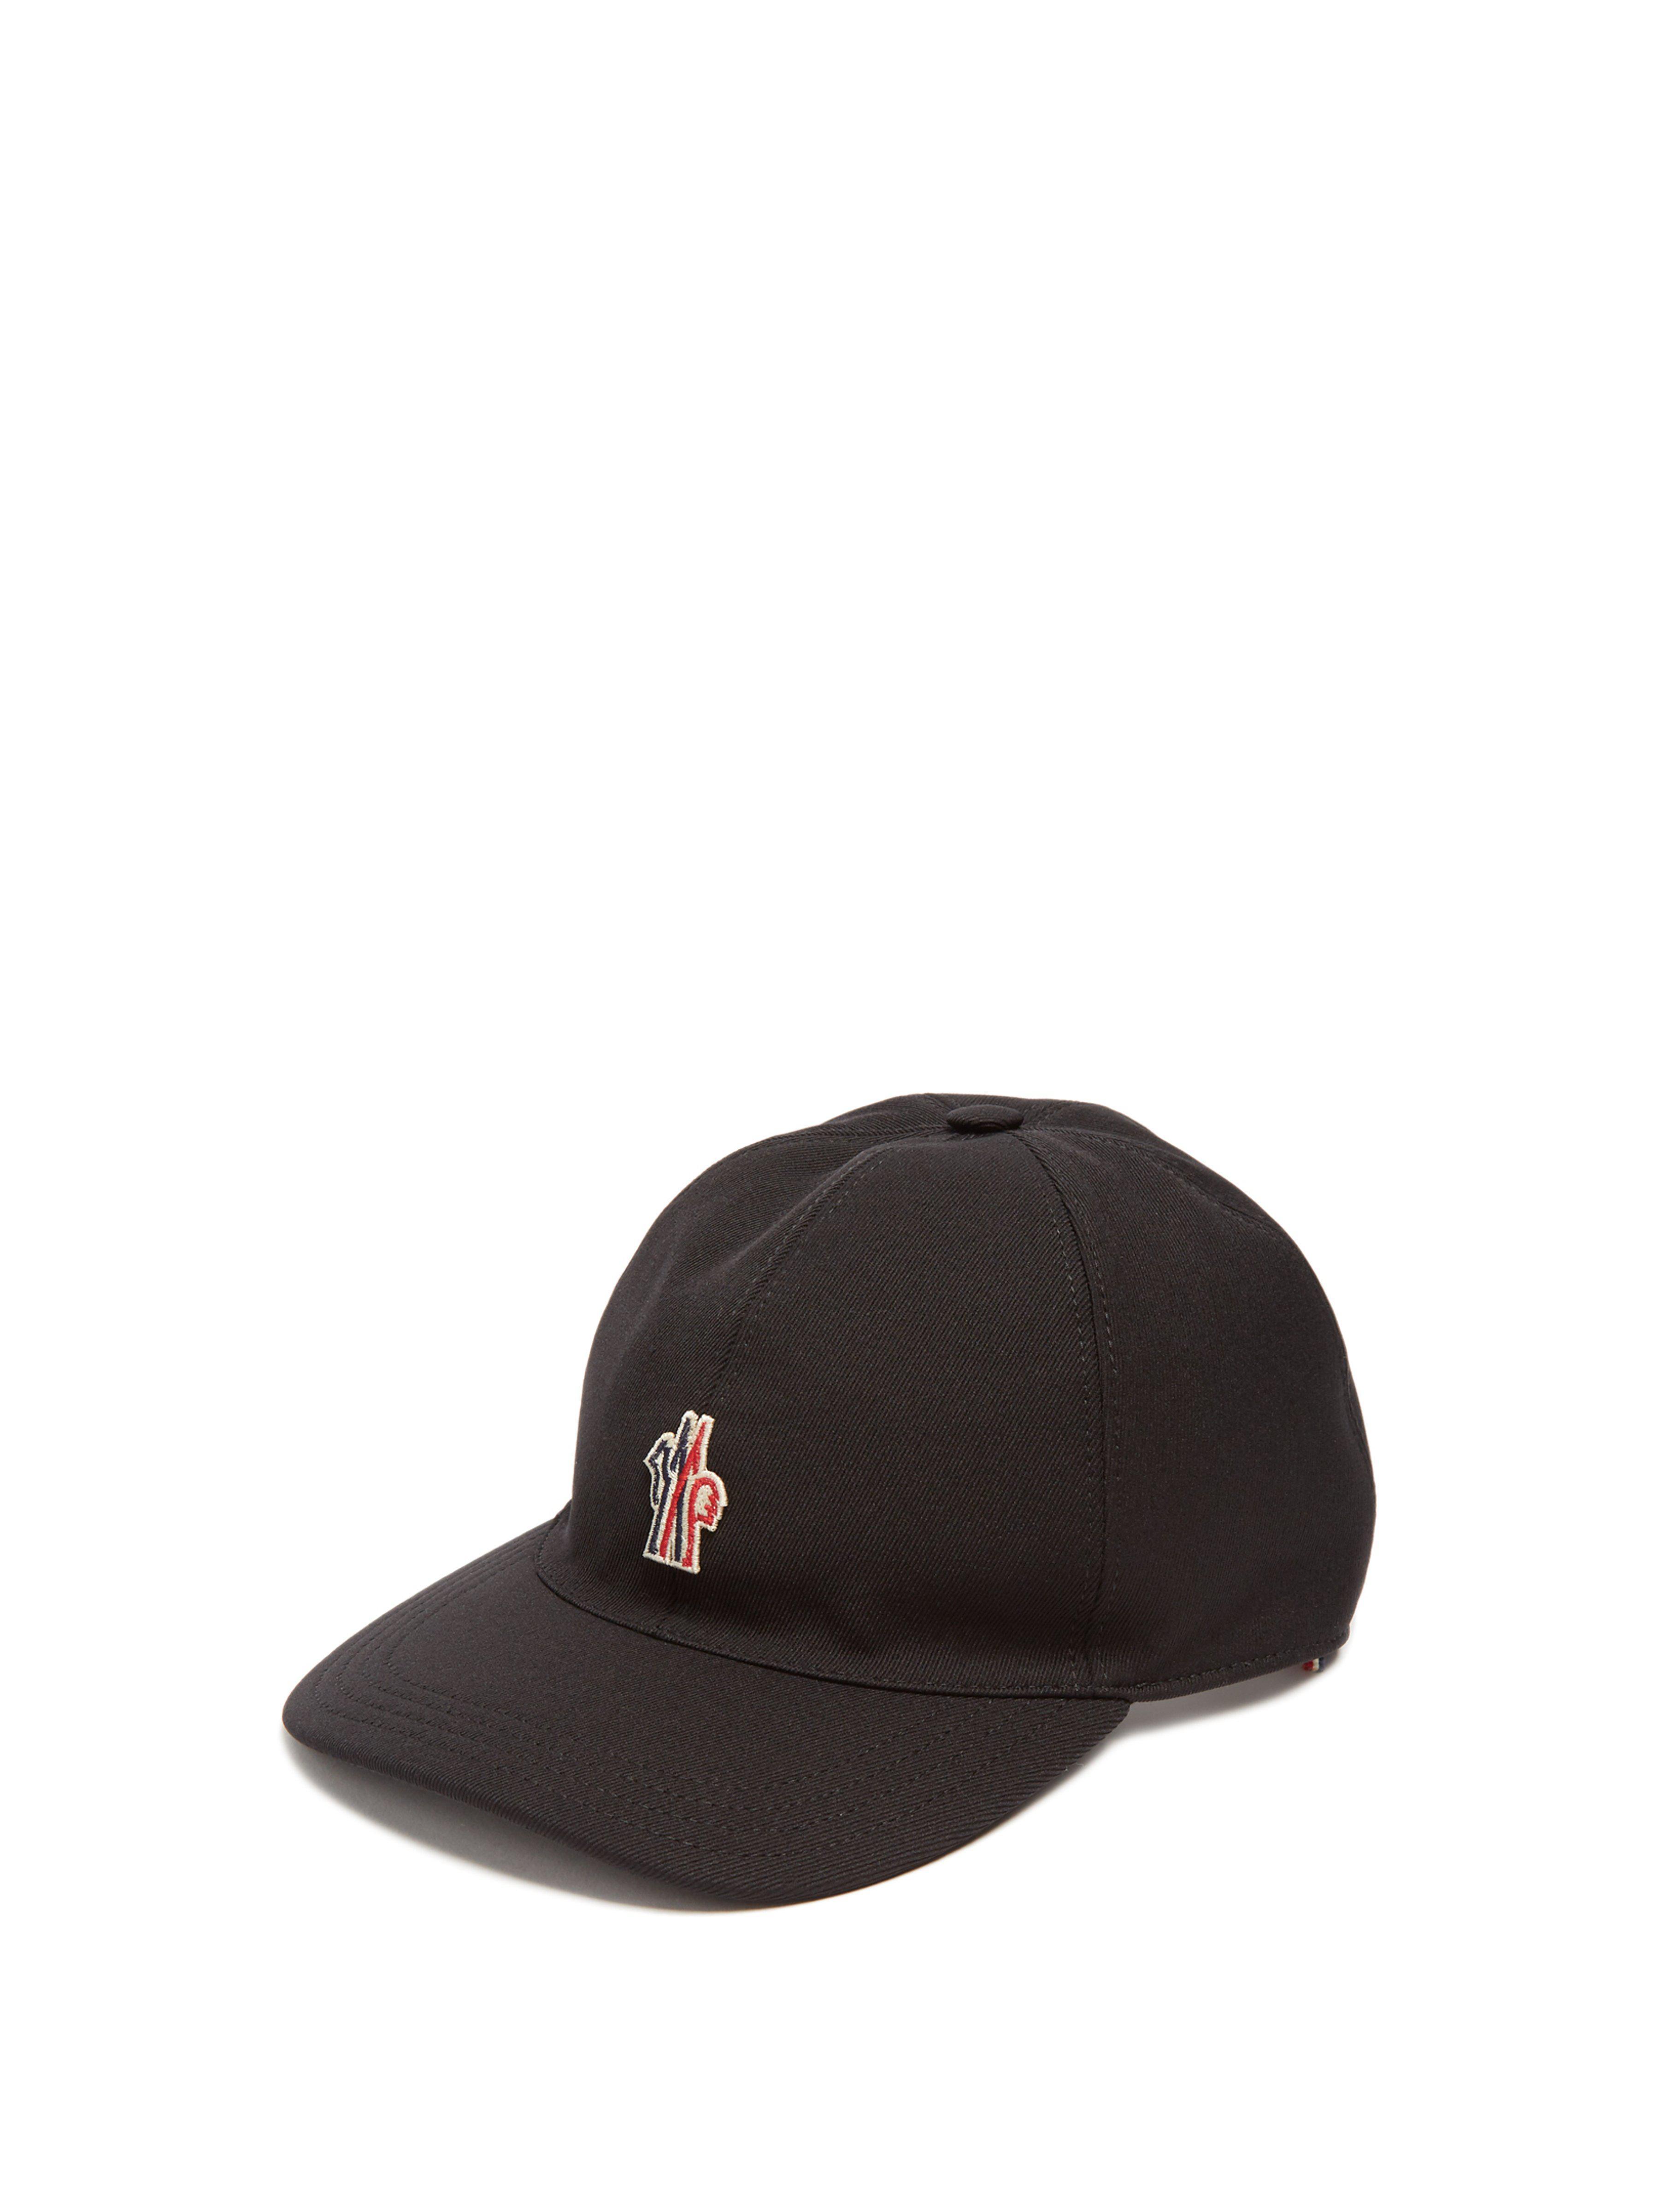 47d386210246c Moncler Grenoble Embroidered Logo Canvas Cap in Black for Men - Lyst